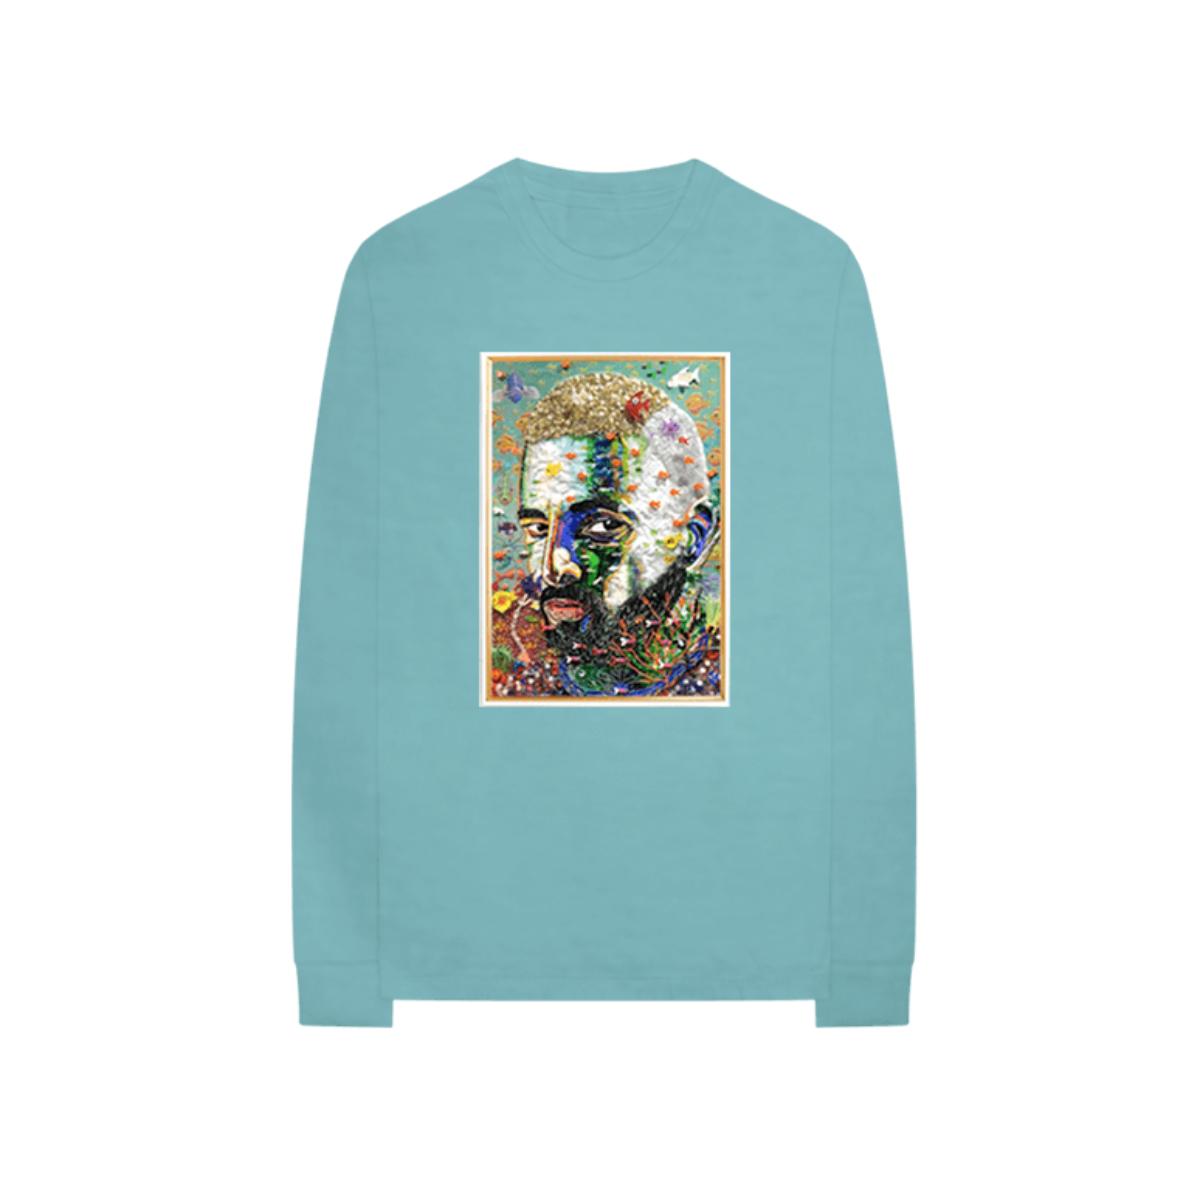 #7DJ Camiseta Retrato Mento con Mangas Largas